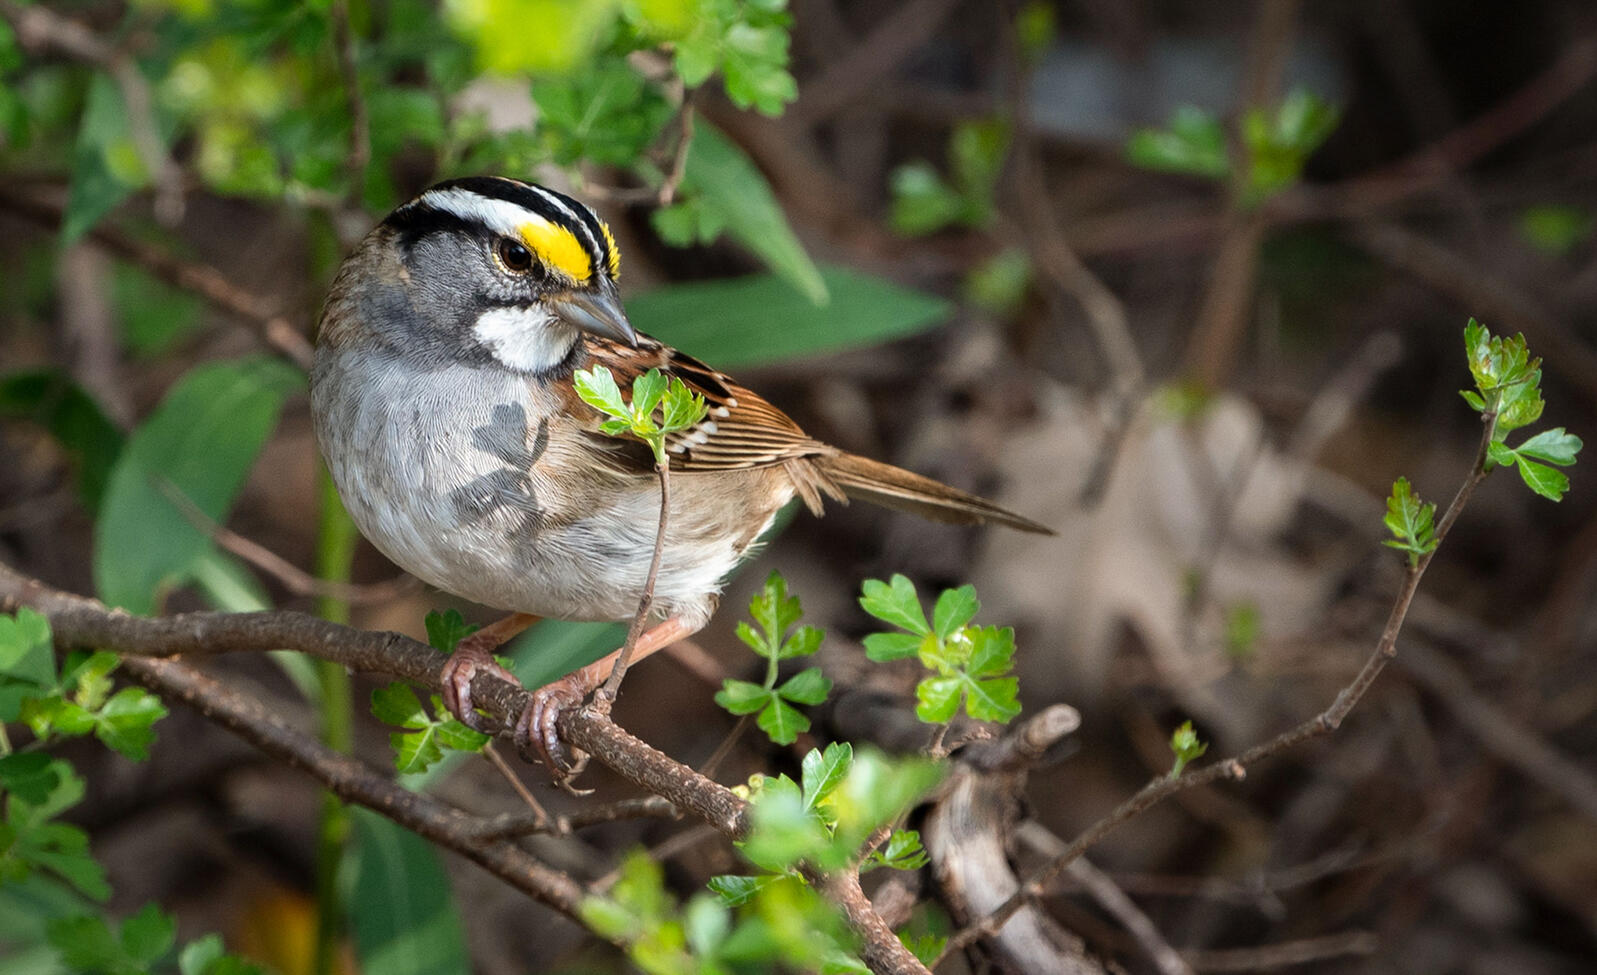 White-throated Sparrow. Tim Harris/Audubon Photography Awards